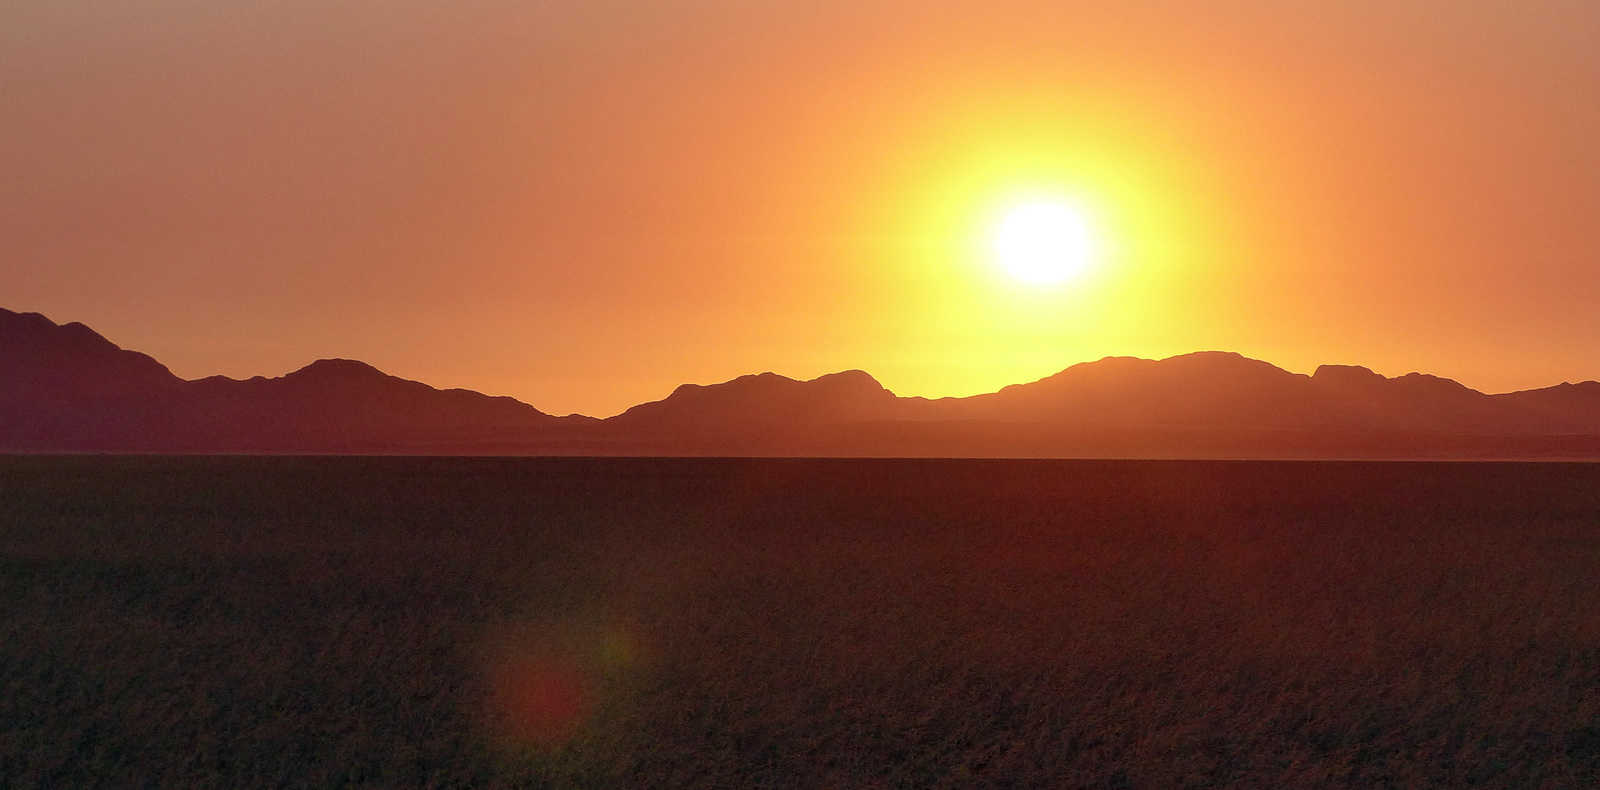 Sunset in the Tiras Mountains, Namibia